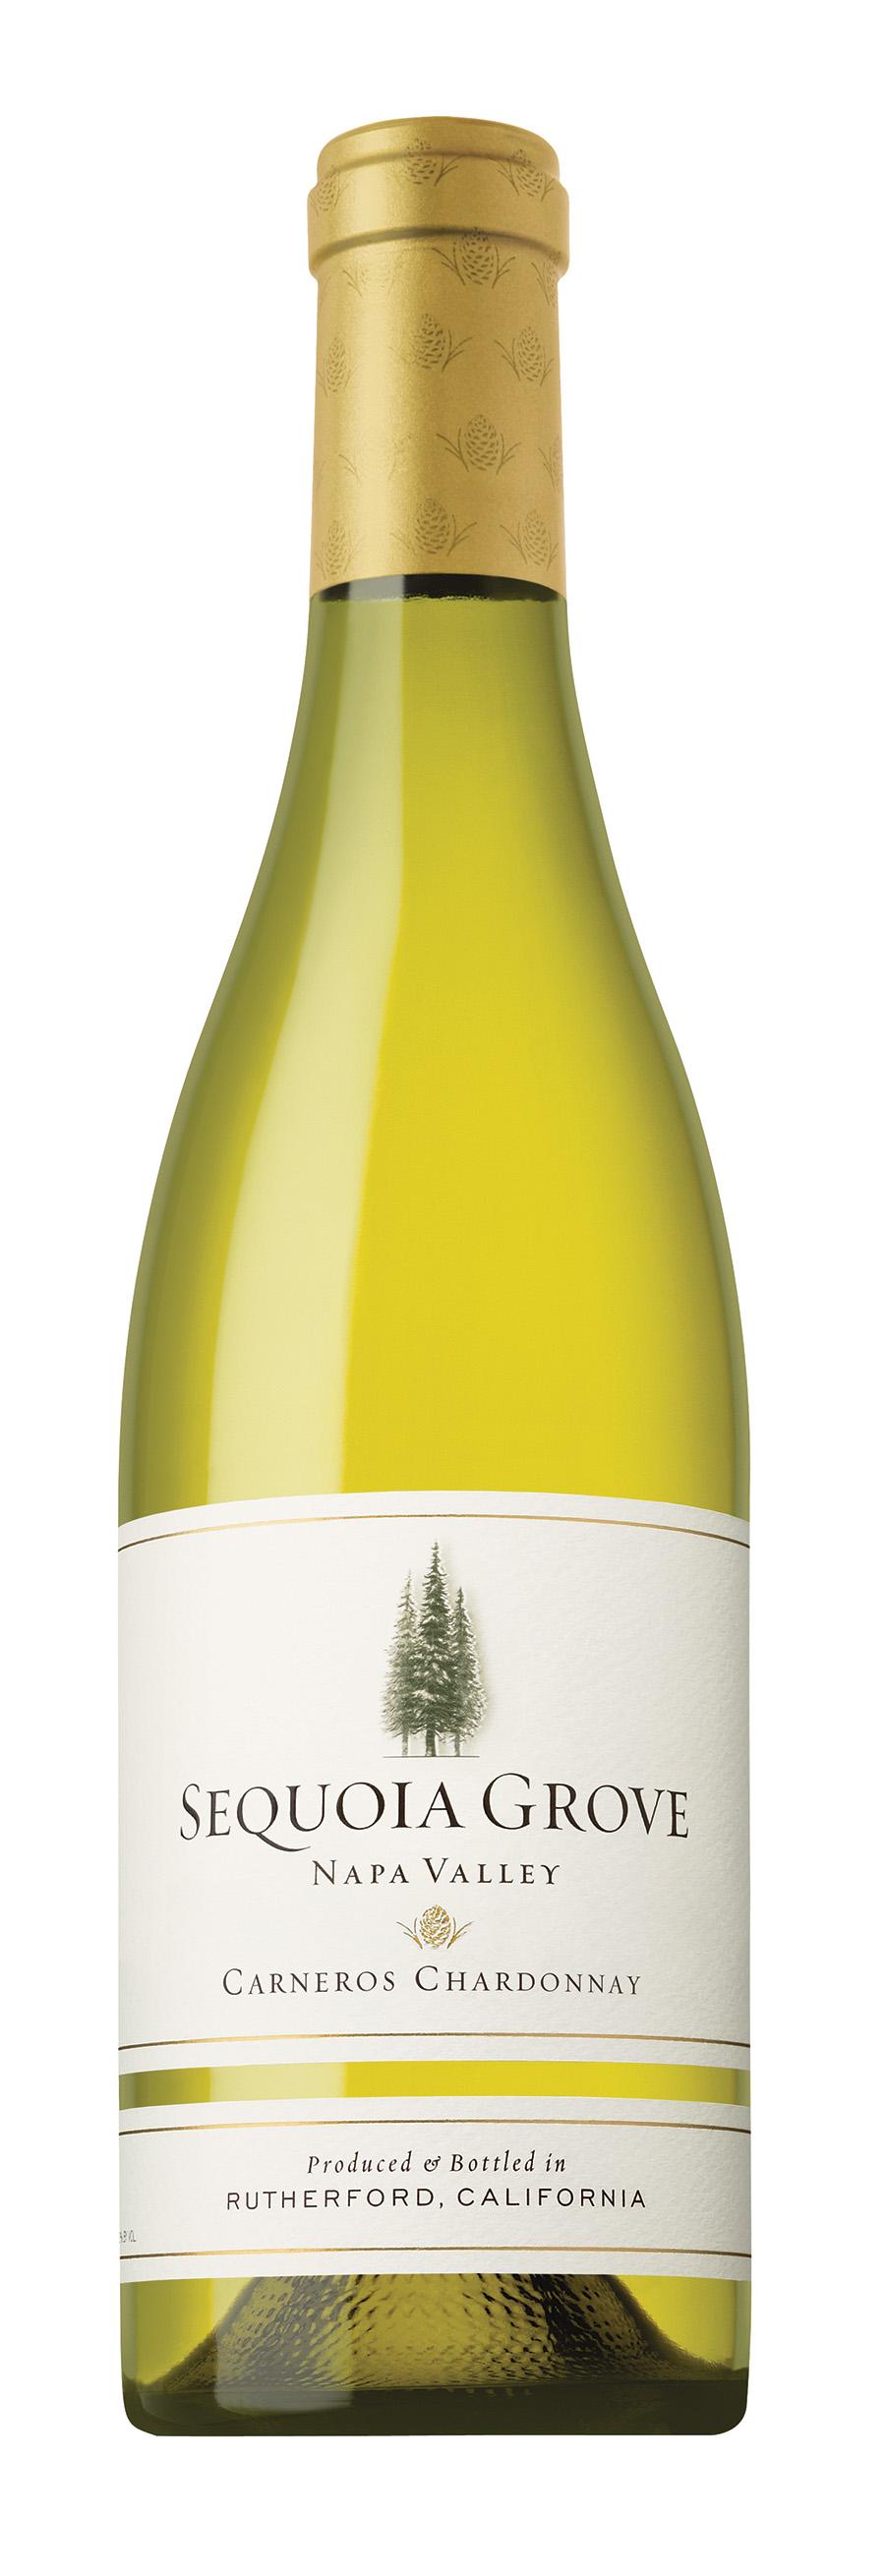 2012 Sequoia Grove Chardonnay Napa Valley